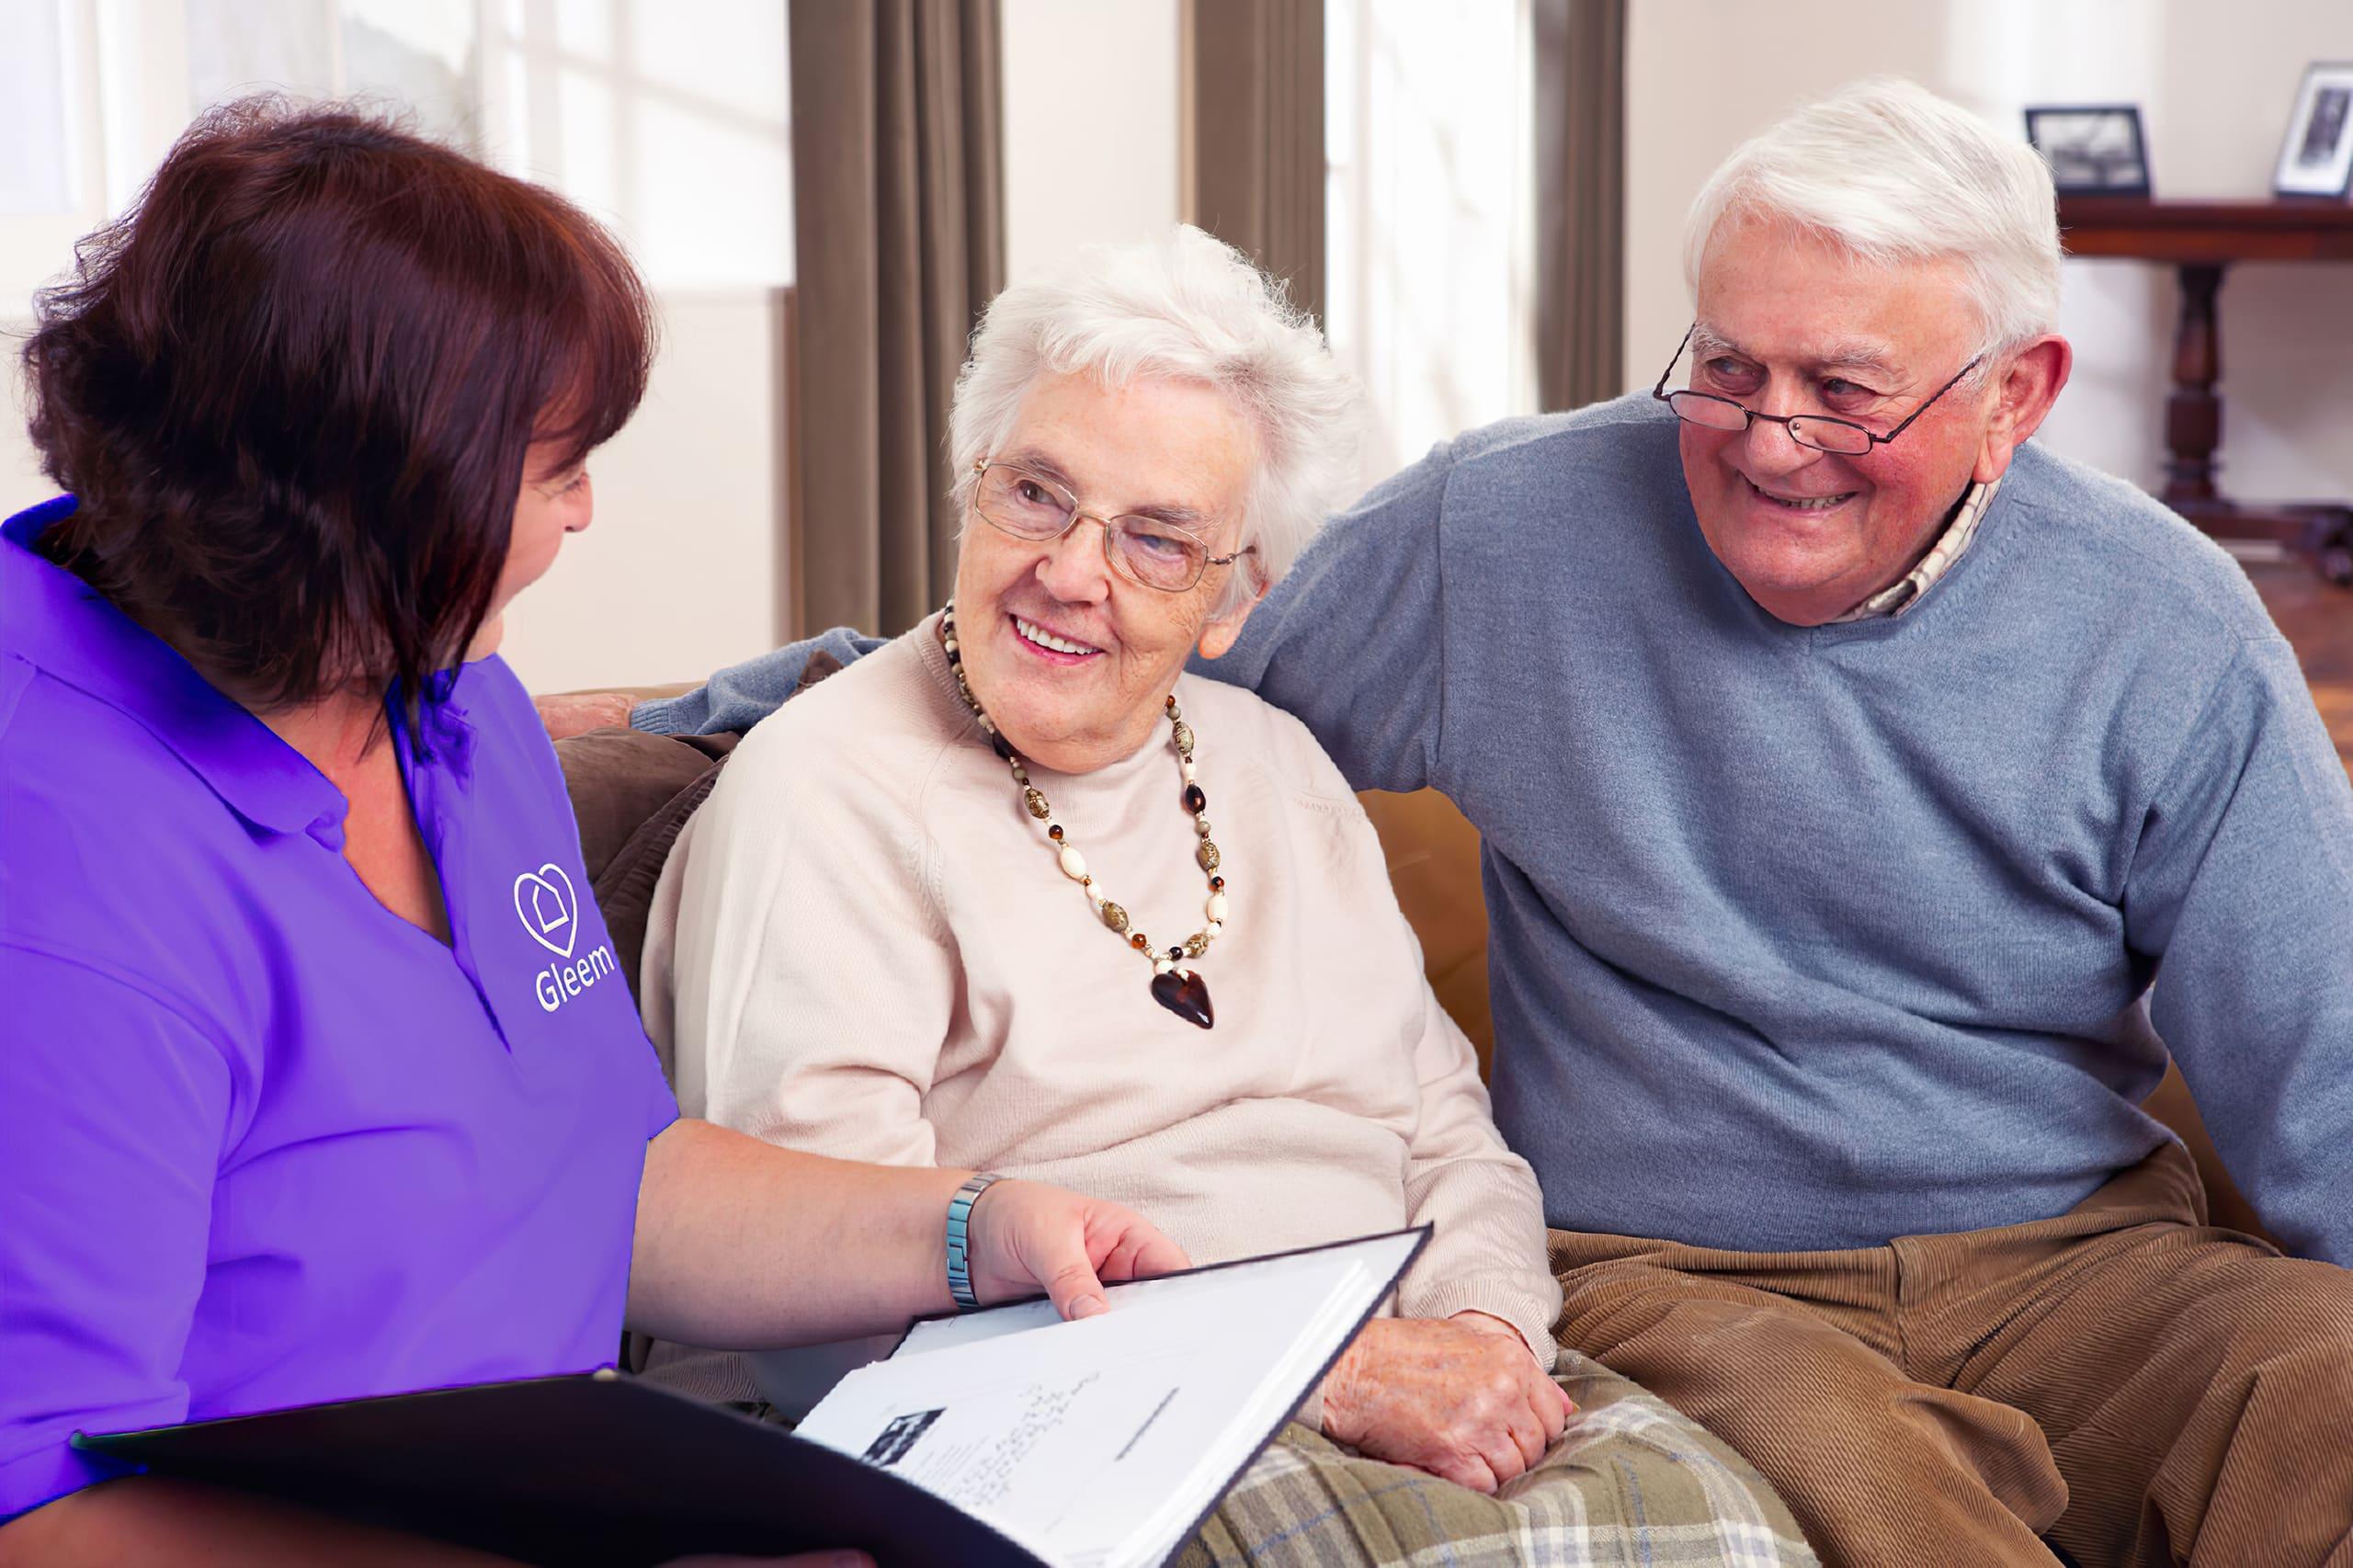 Gleem plus helper with two elderly persons.